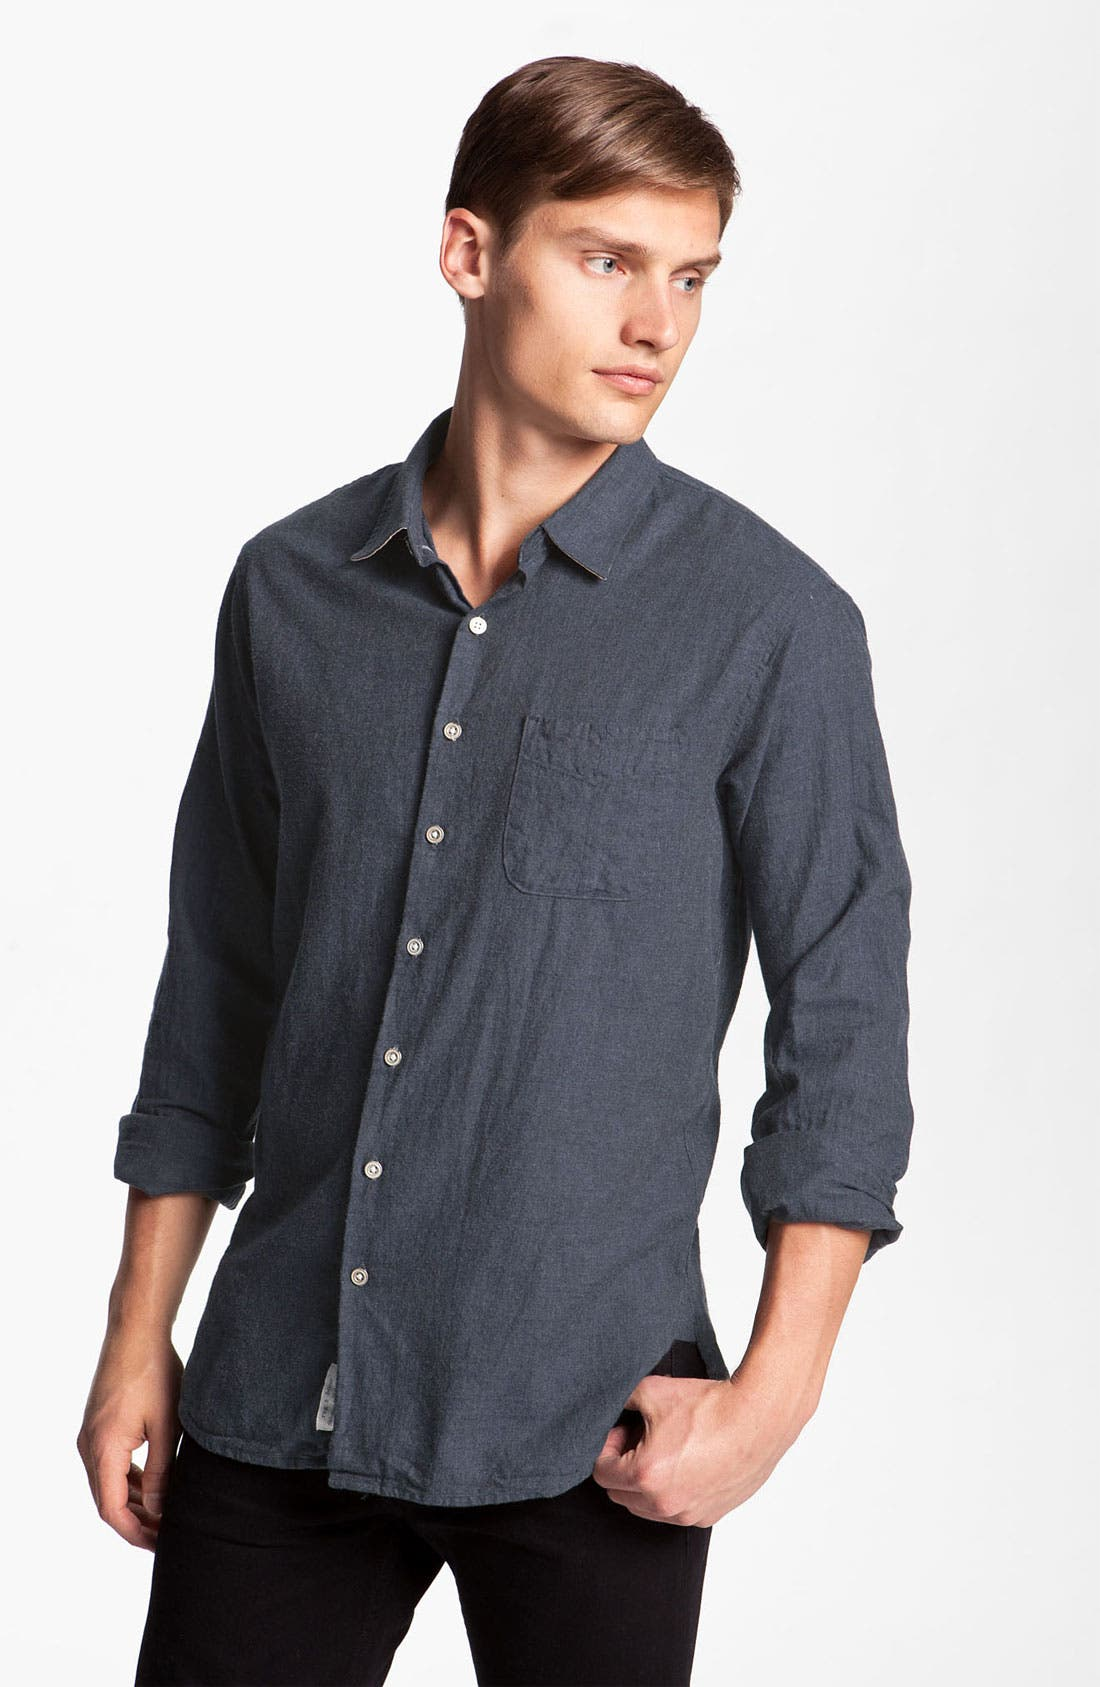 Alternate Image 1 Selected - rag & bone 'Beach' Woven Shirt